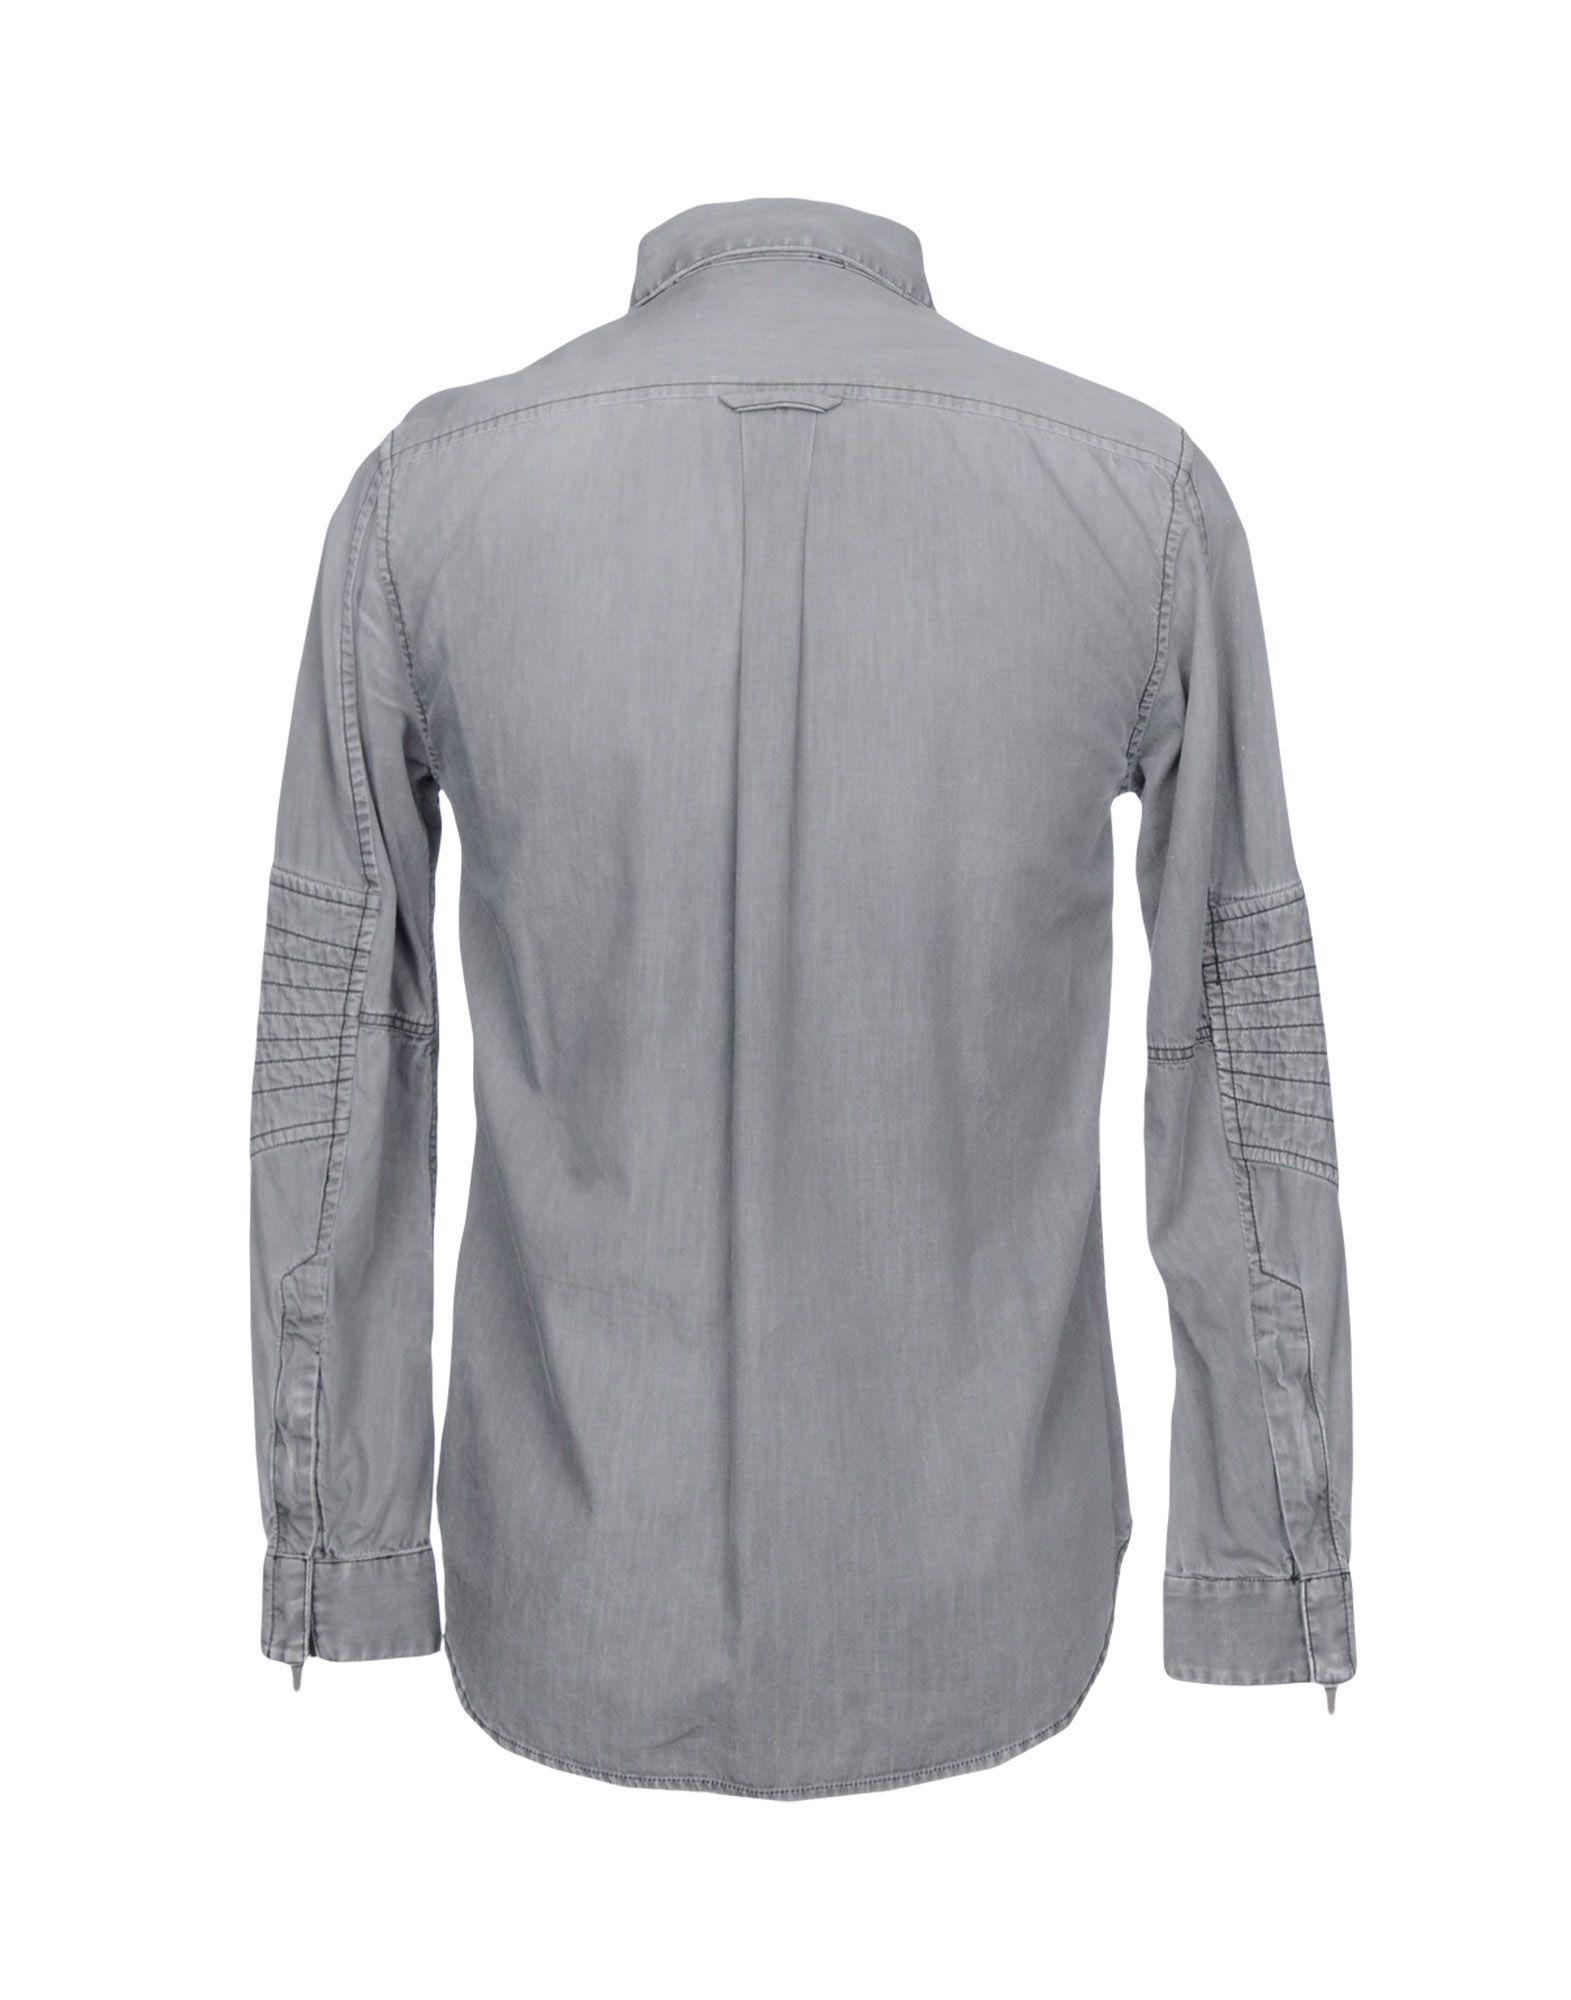 Camicia Jeans Karl 38736536UO Lagerfeld Uomo - 38736536UO Karl 0109a8